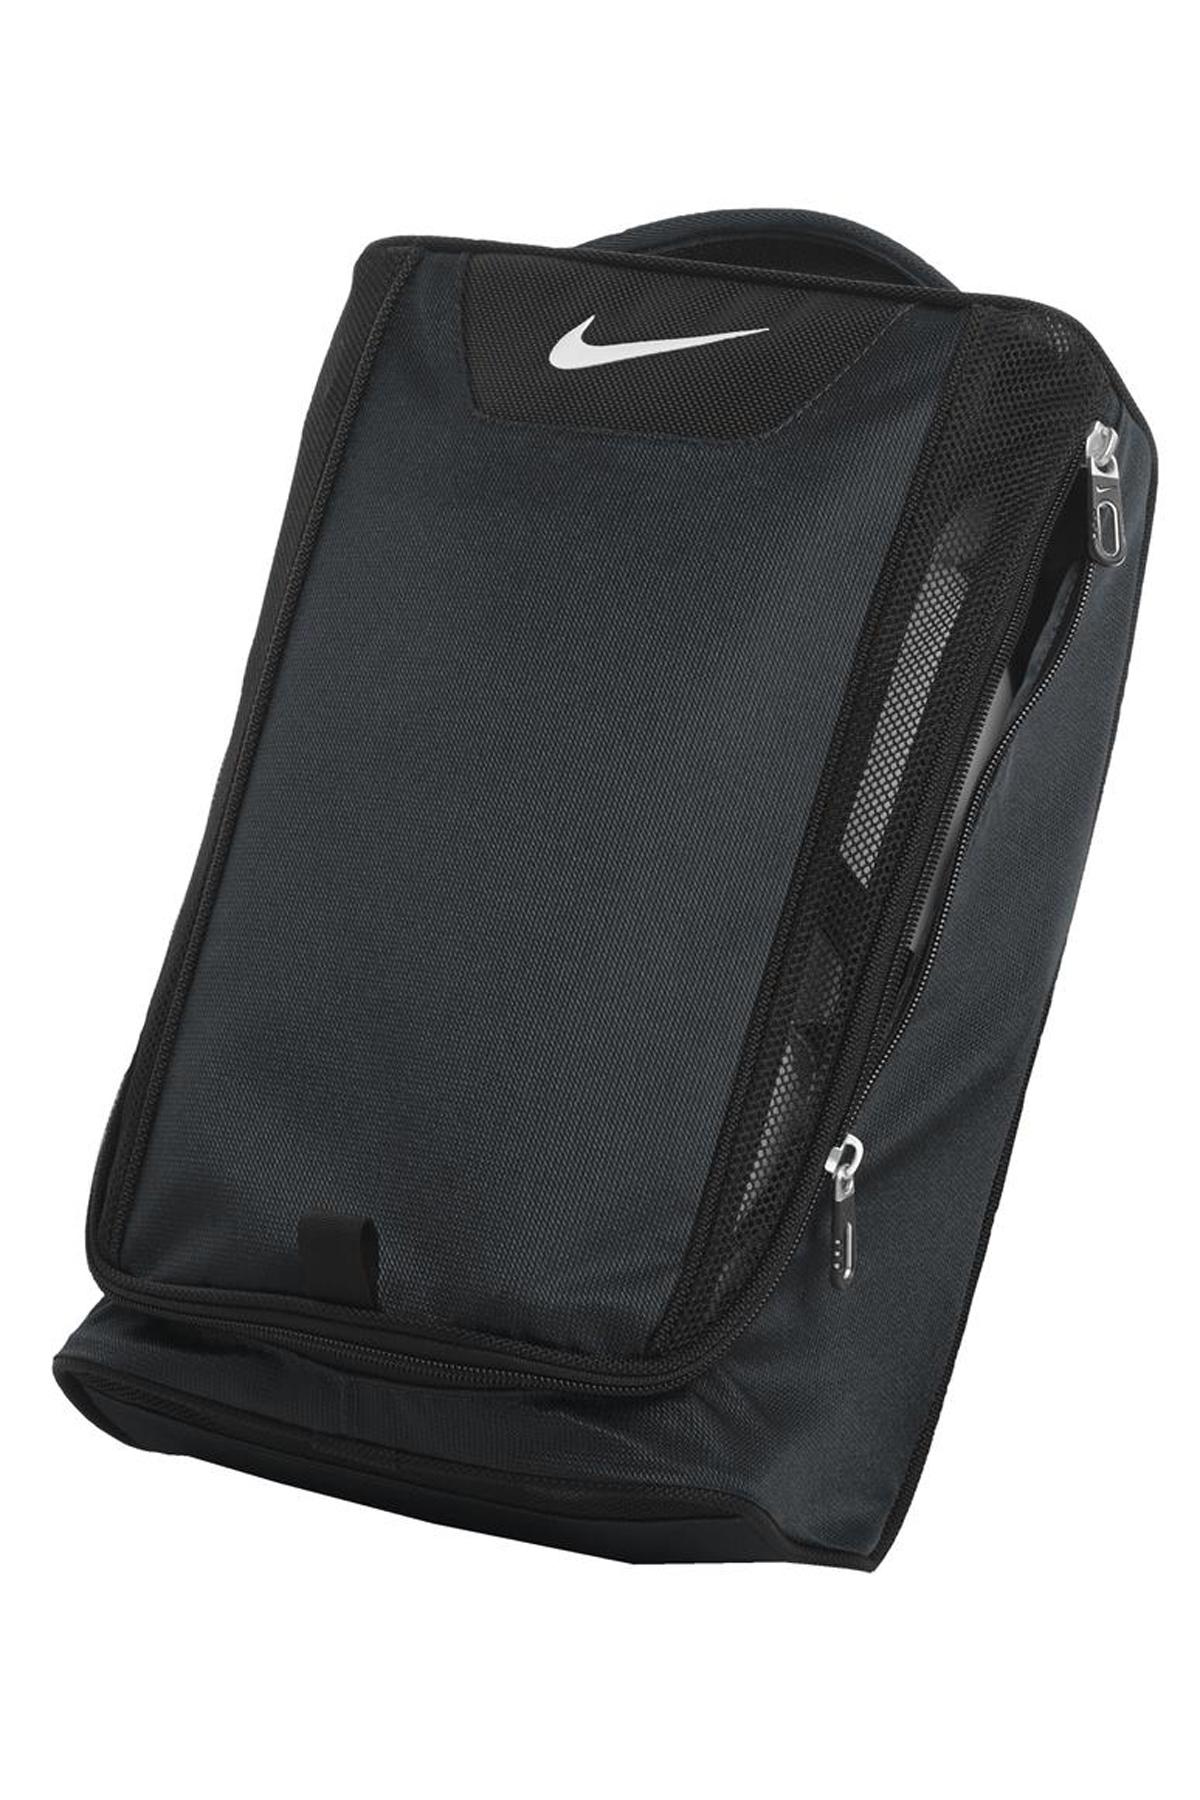 Bags-Golf-6